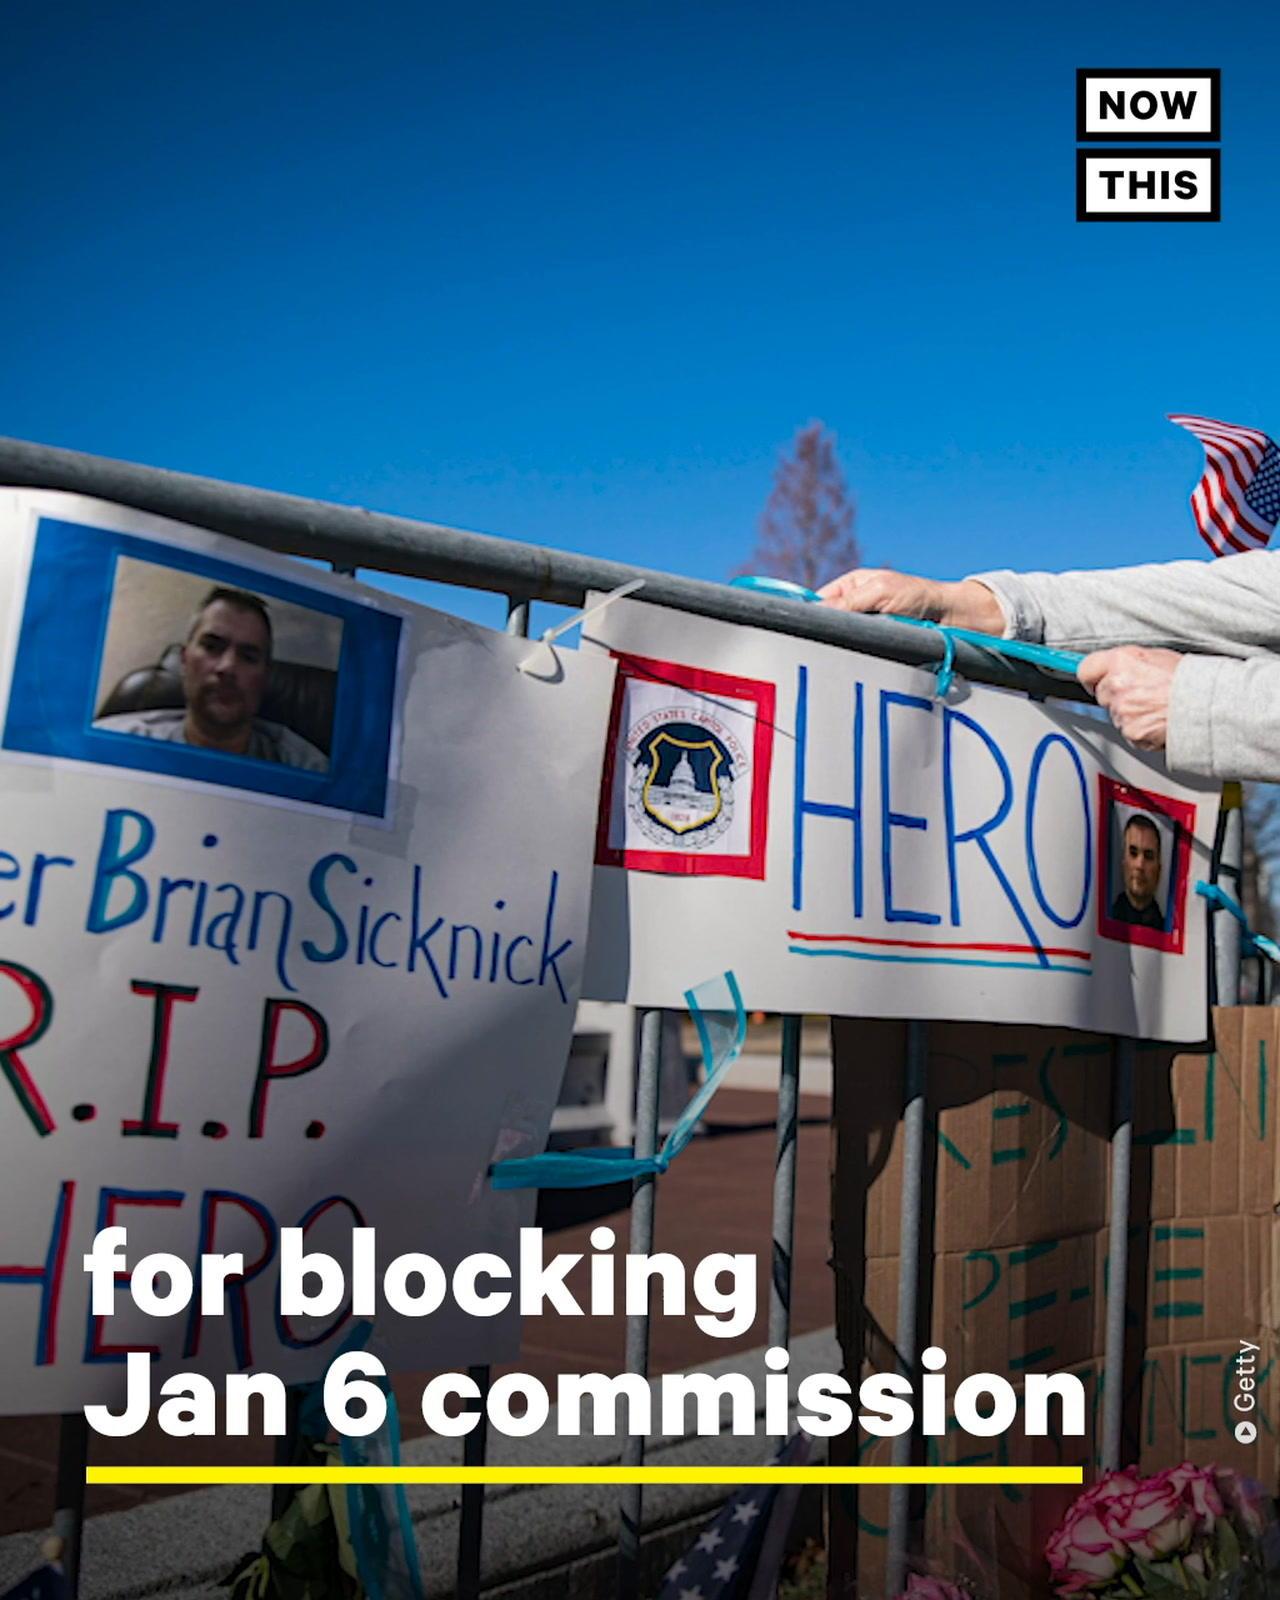 Former Partner of Fallen Capitol Officer Calls for Jan 6 Investigation